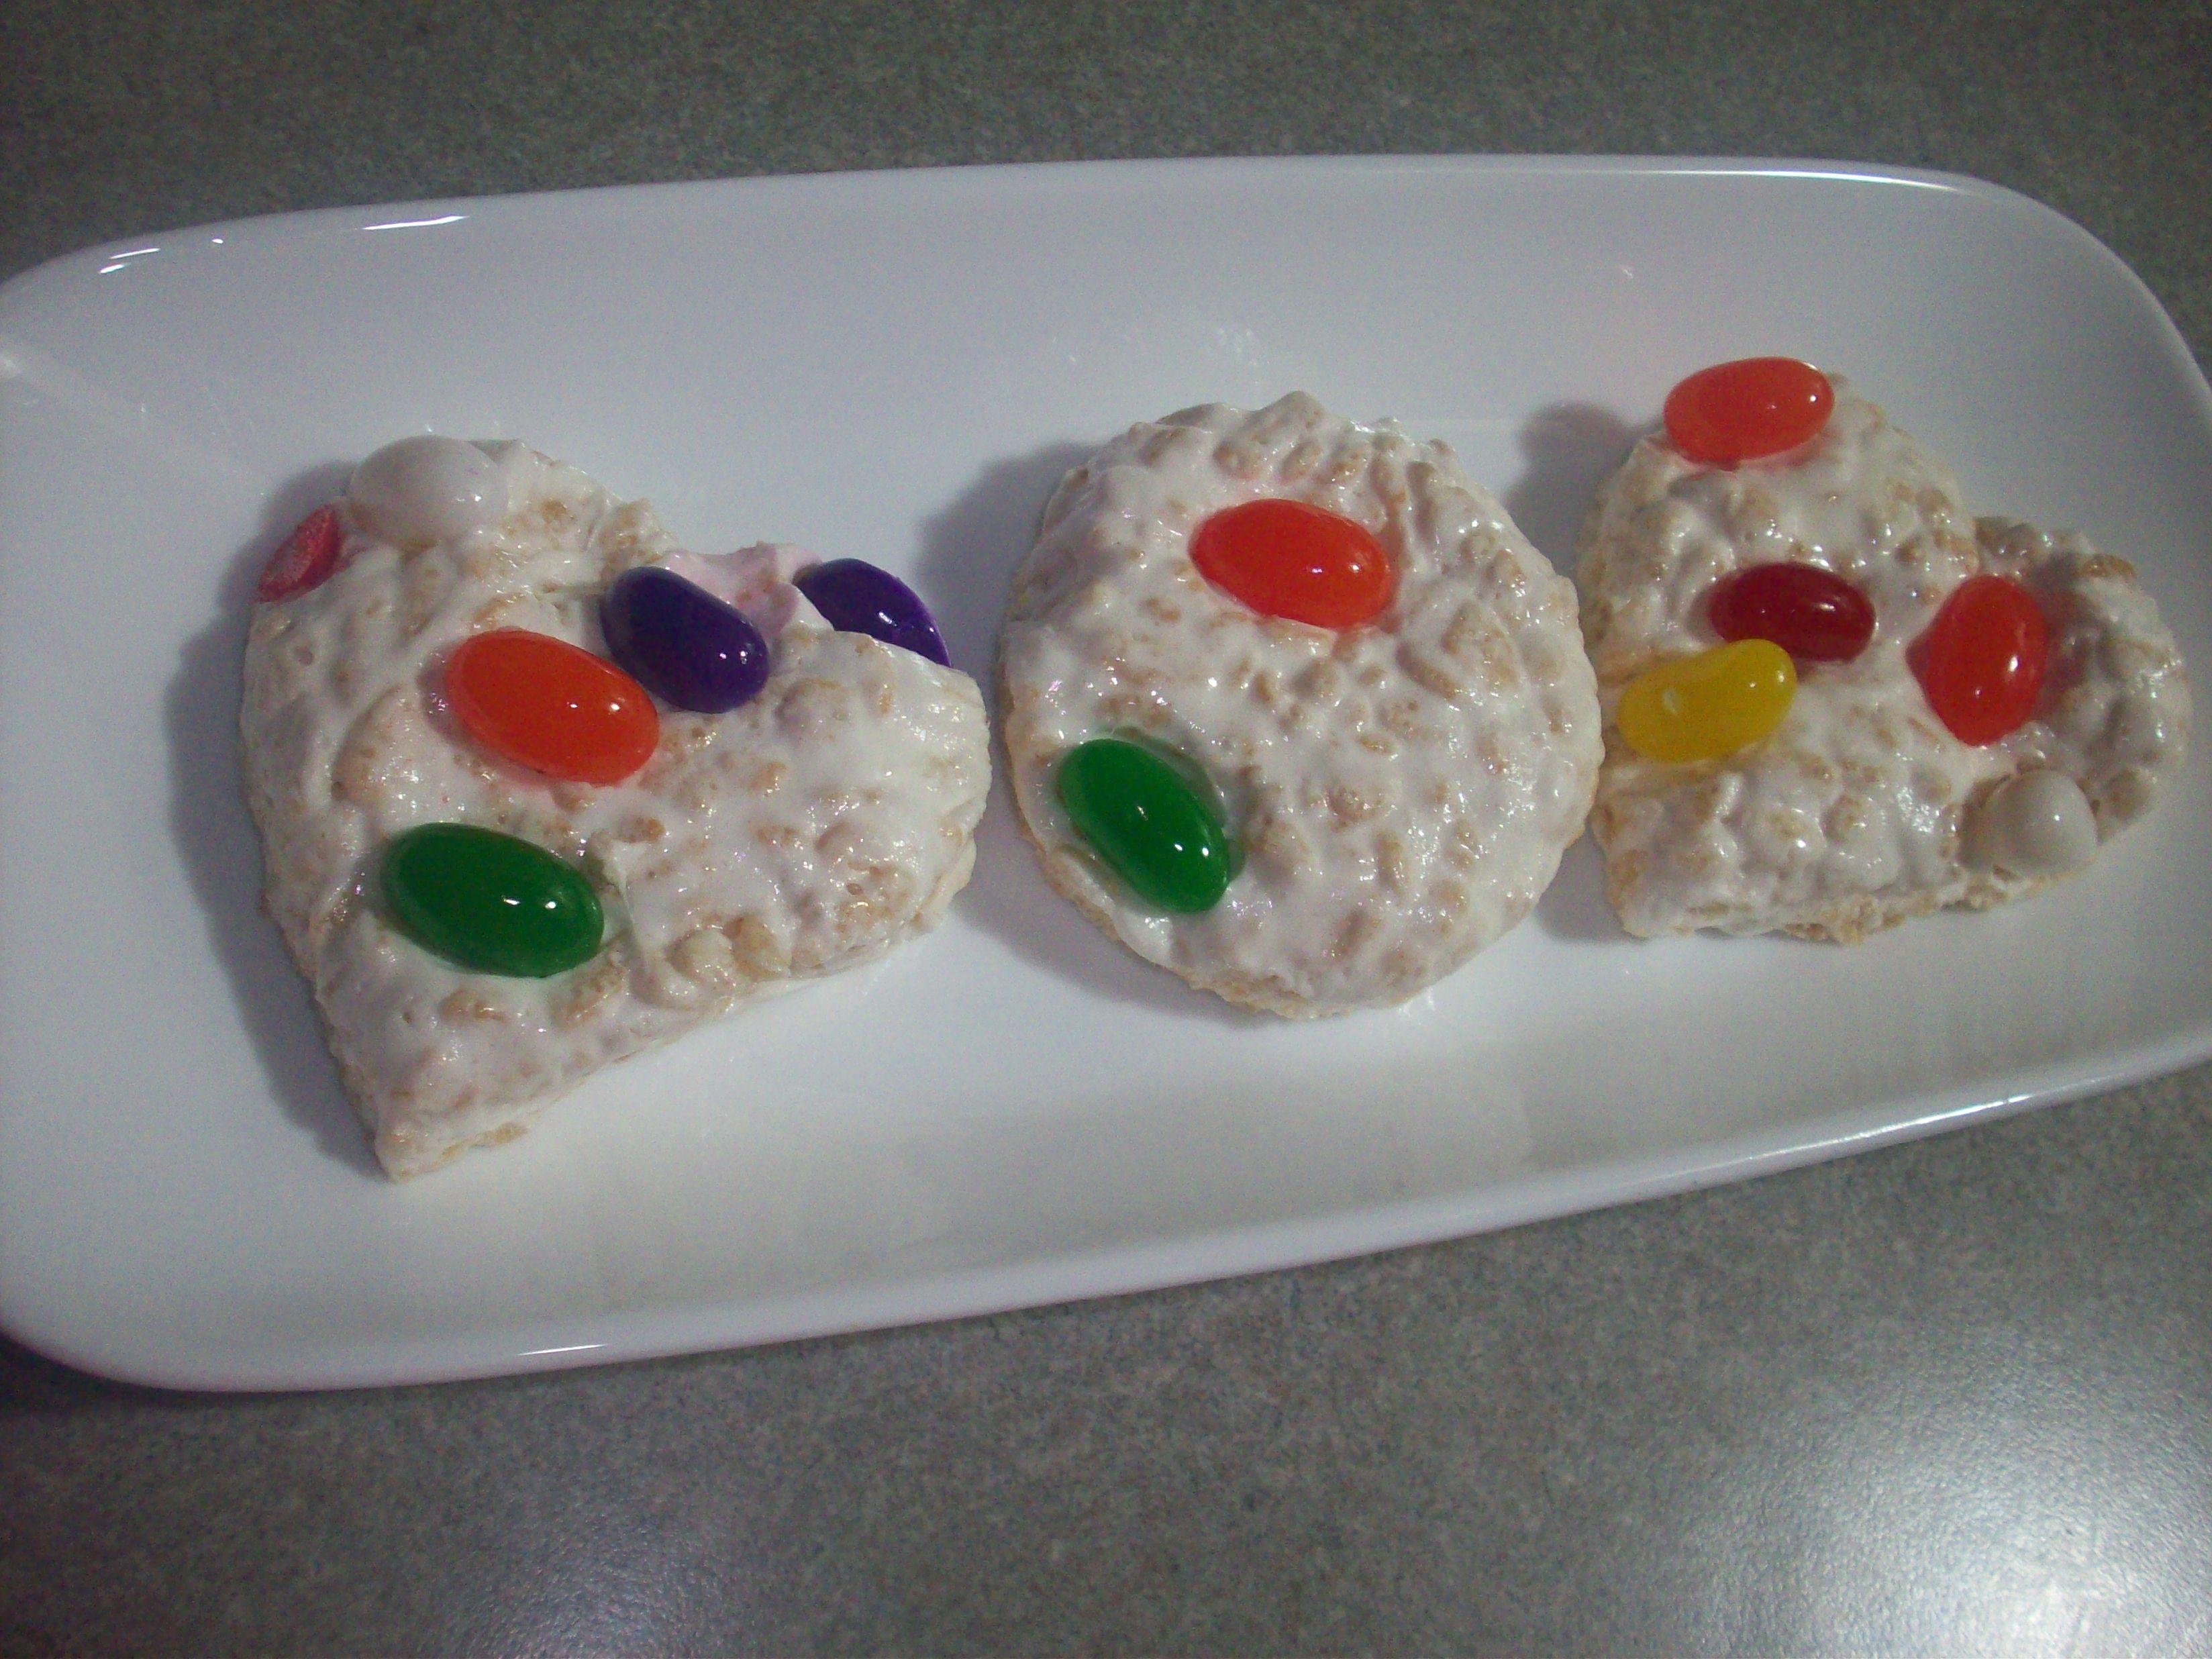 https://foodloader.net/cutie_2010-05-23_Rainbow_Rice_Krispies_Treats.jpg